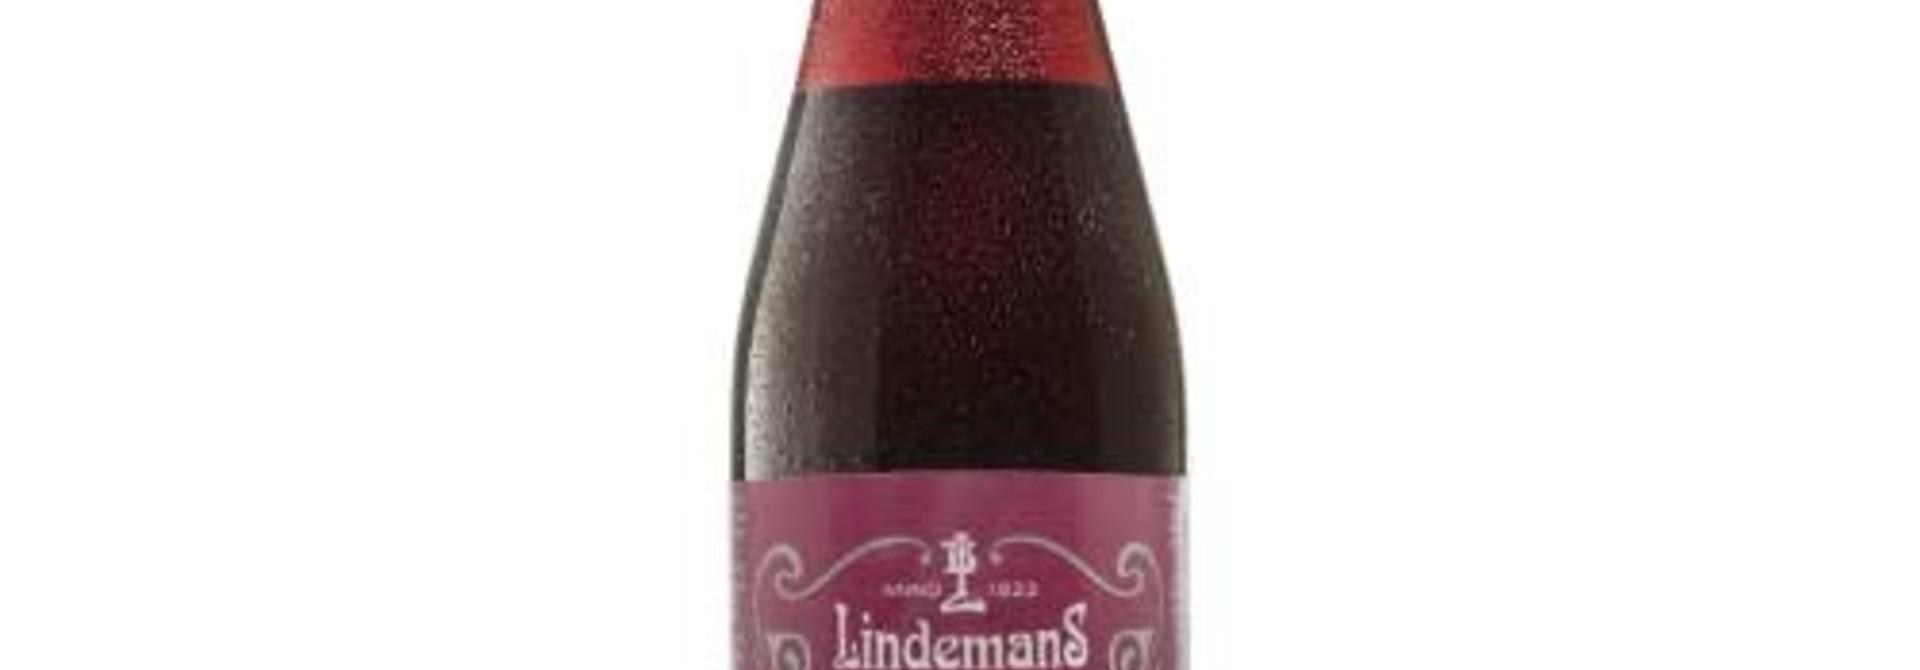 LINDEMANS FRAMBOOS 25CL